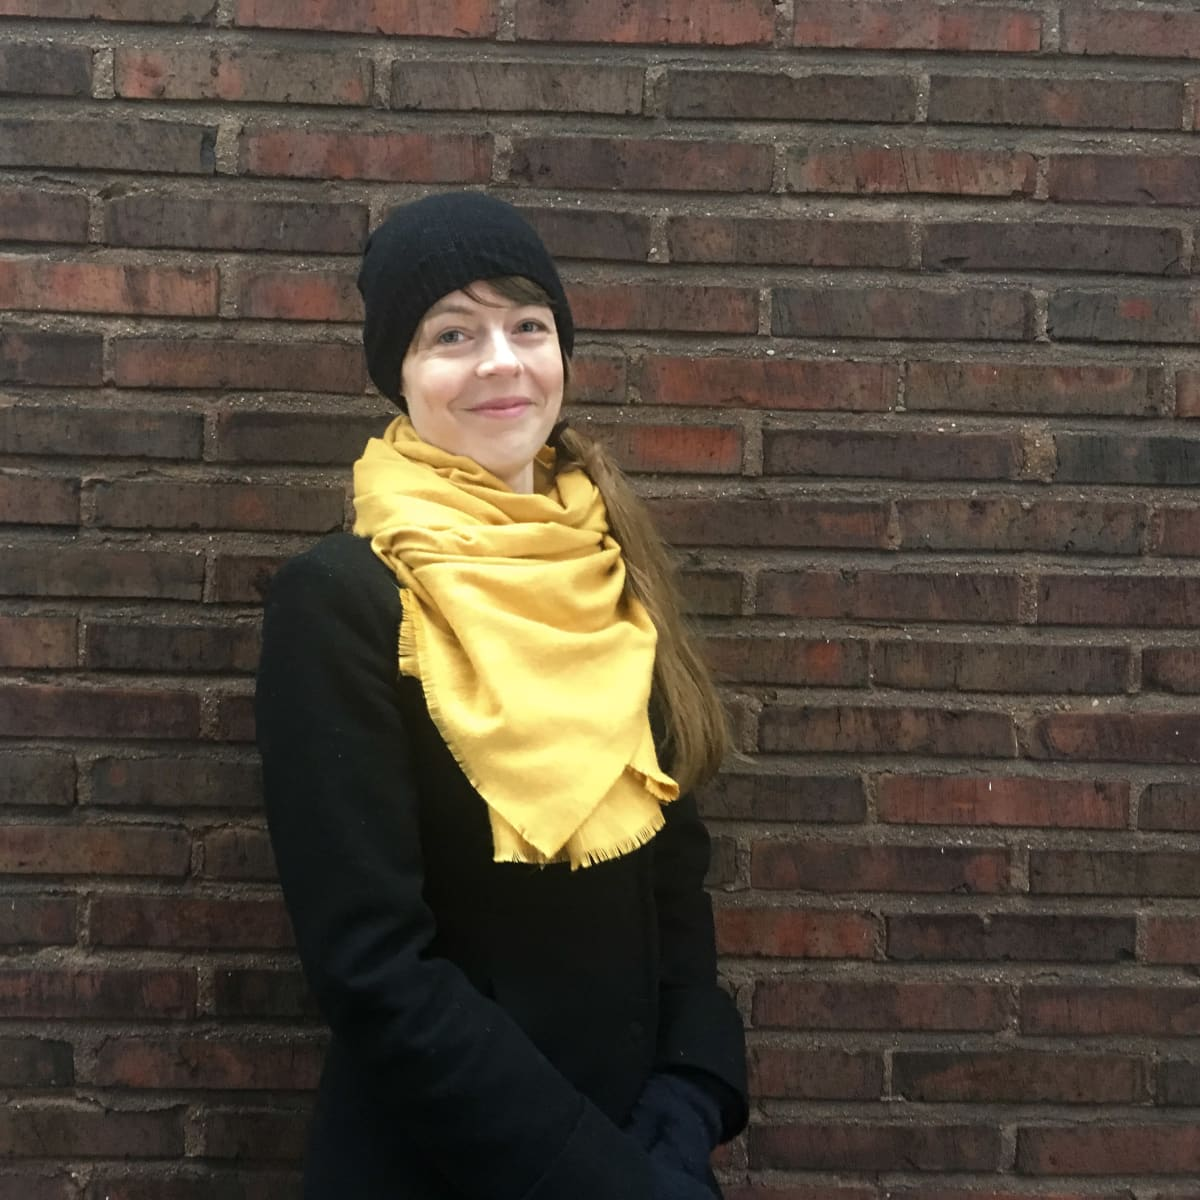 Johanna Lilius tutkijaprofessori, Aalto-yliopisto